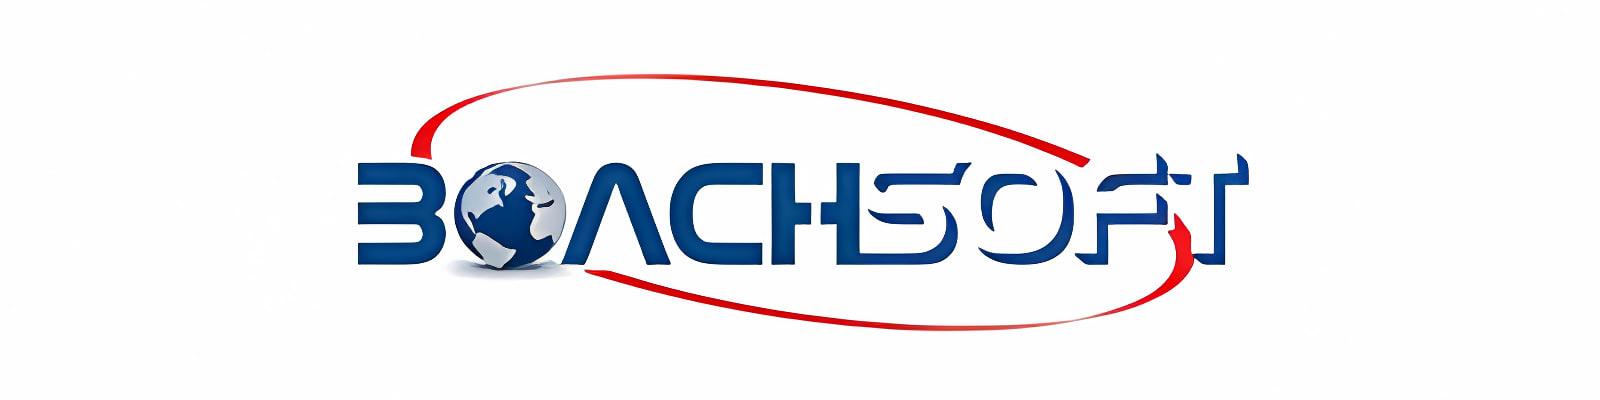 Boachsoft Smartmanager 2013